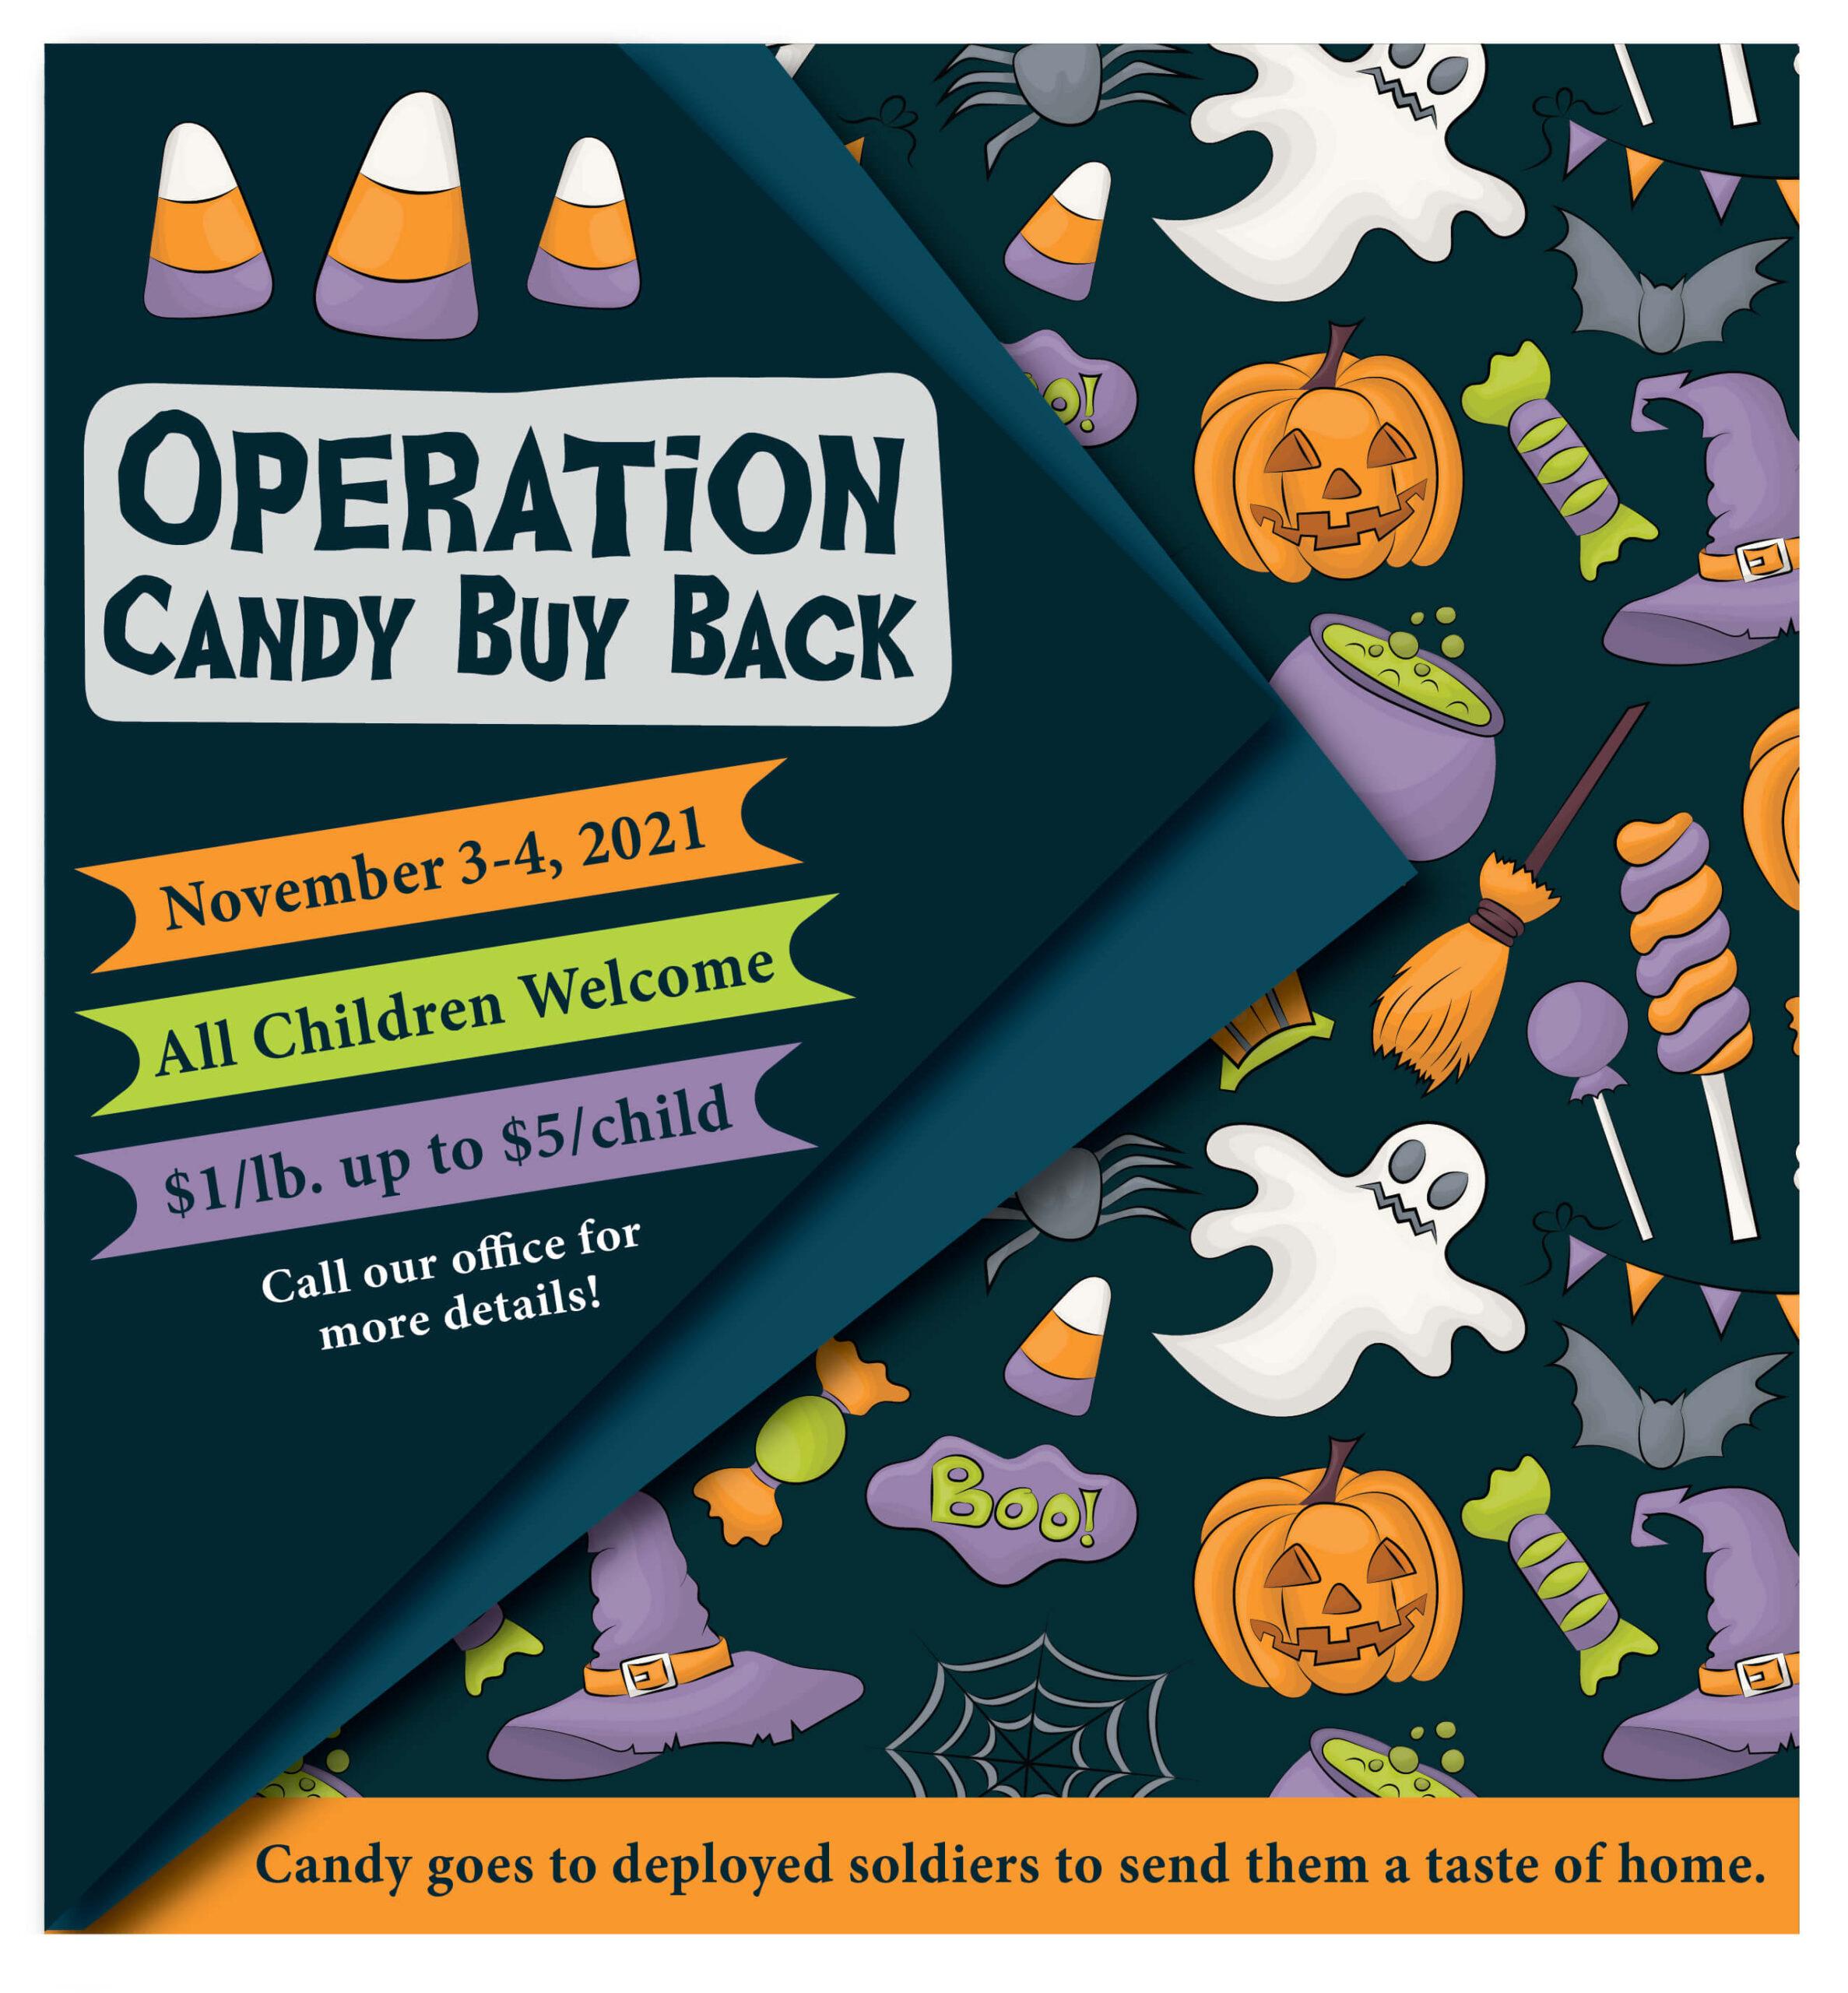 2021 Candy Buy Back